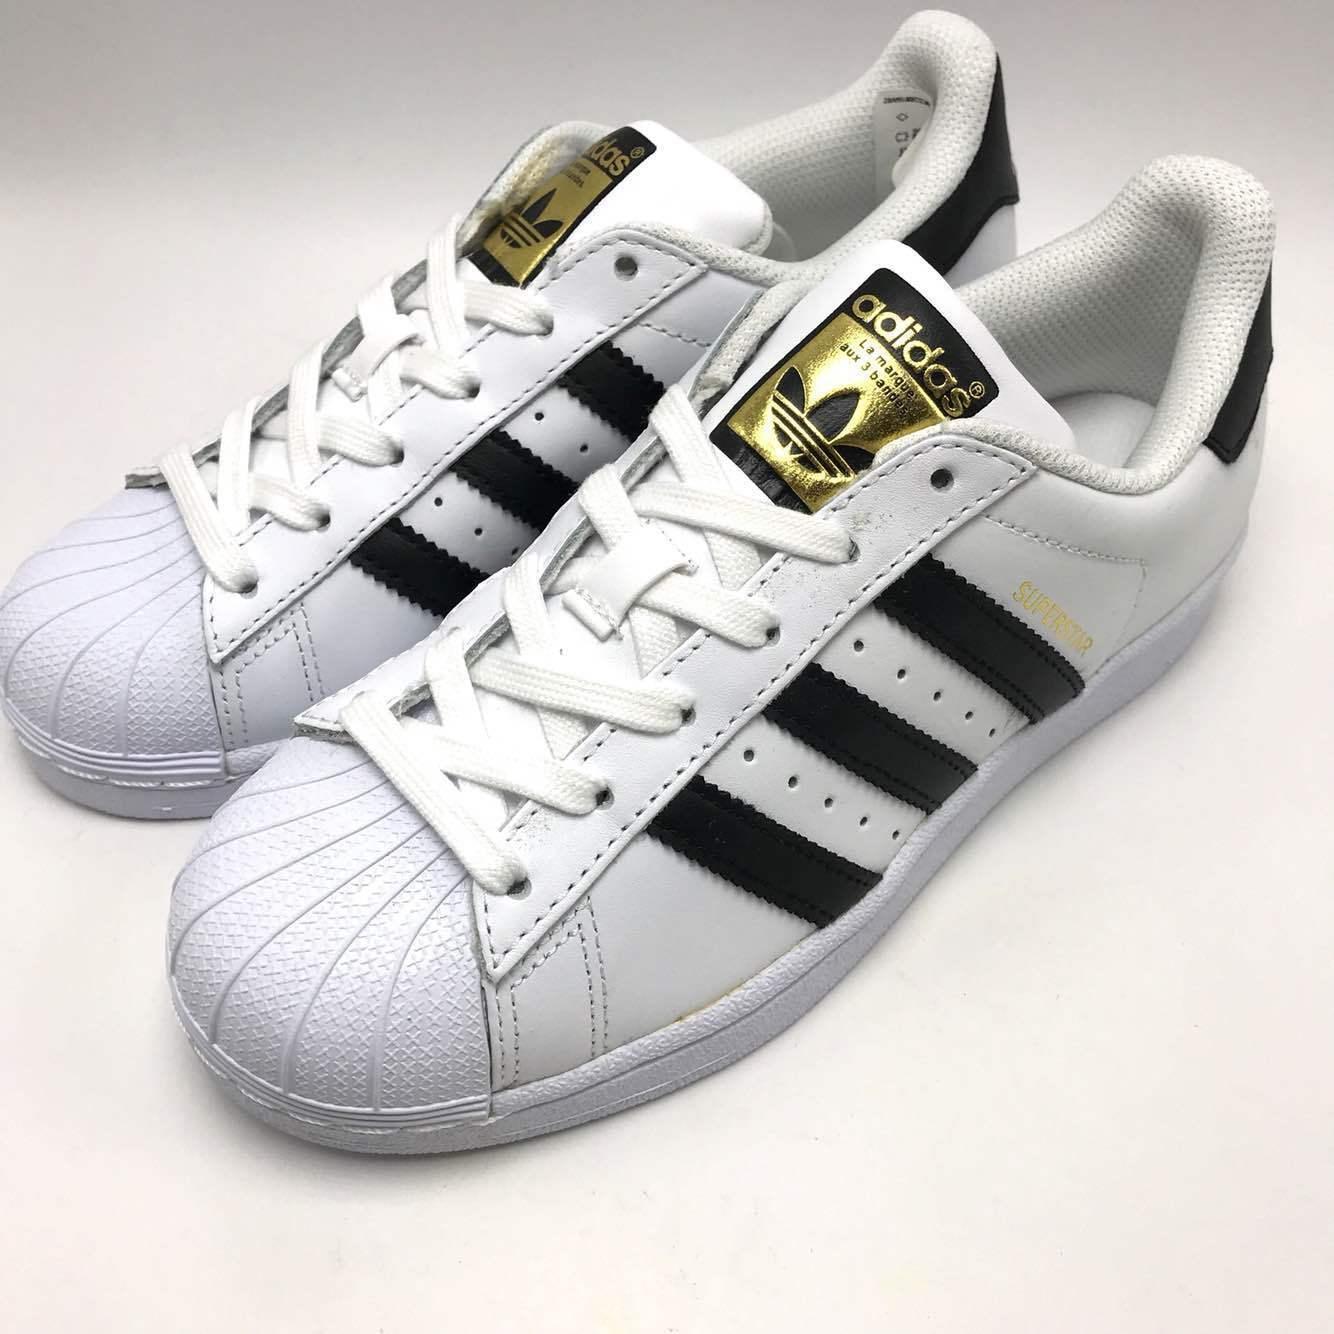 3c8f6788 Women's adidas Original's Superstar Shoe C77153 White Size 7.5 for ...